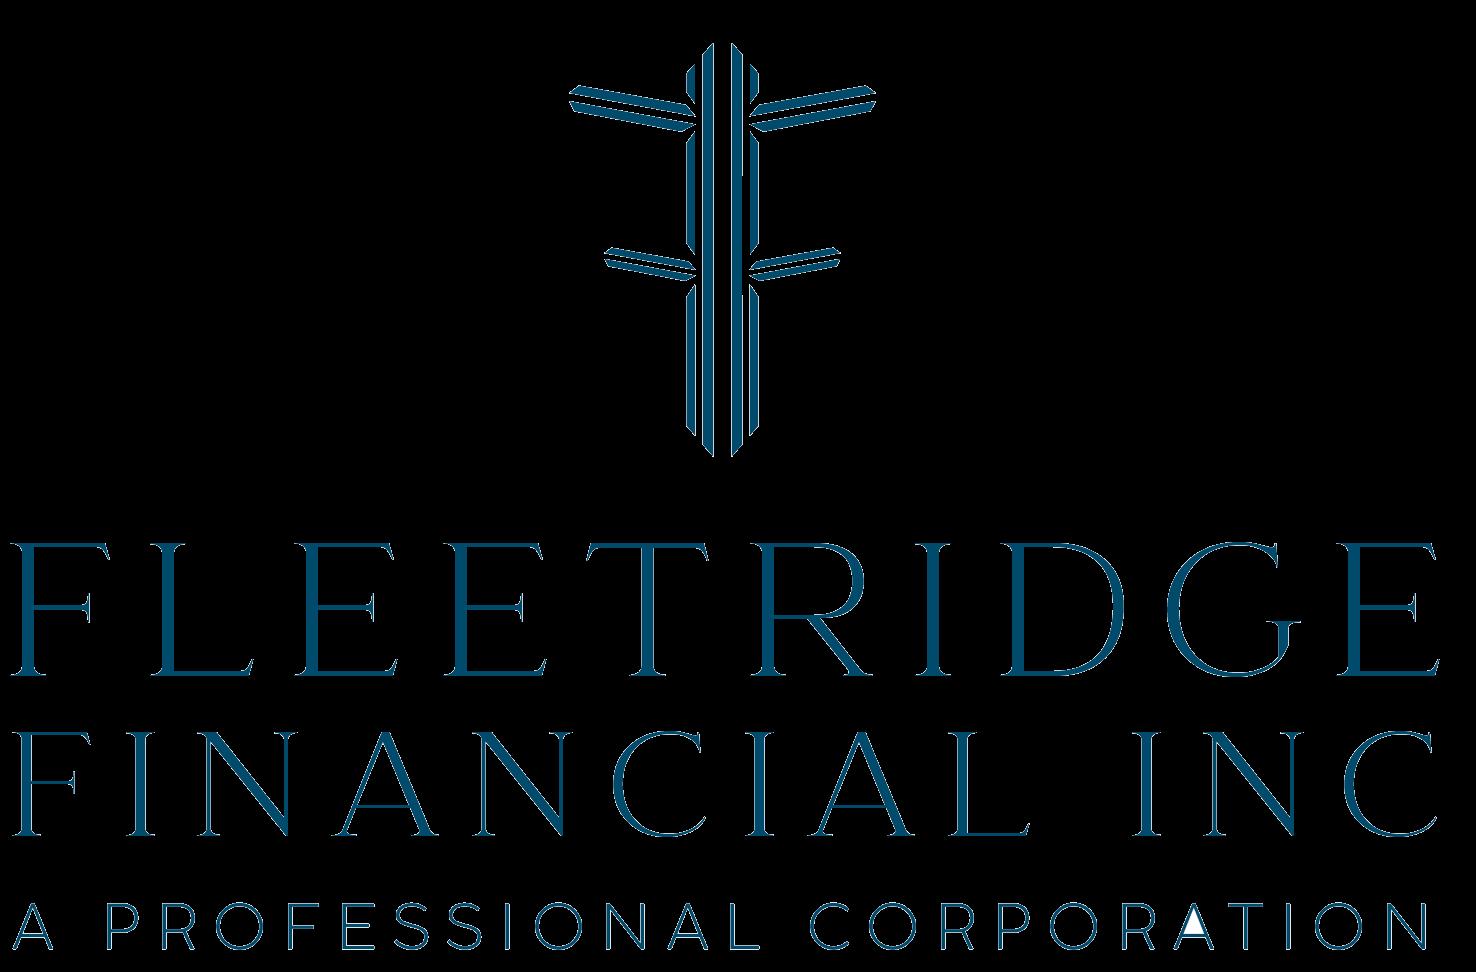 Fleetridge Financial, Inc.